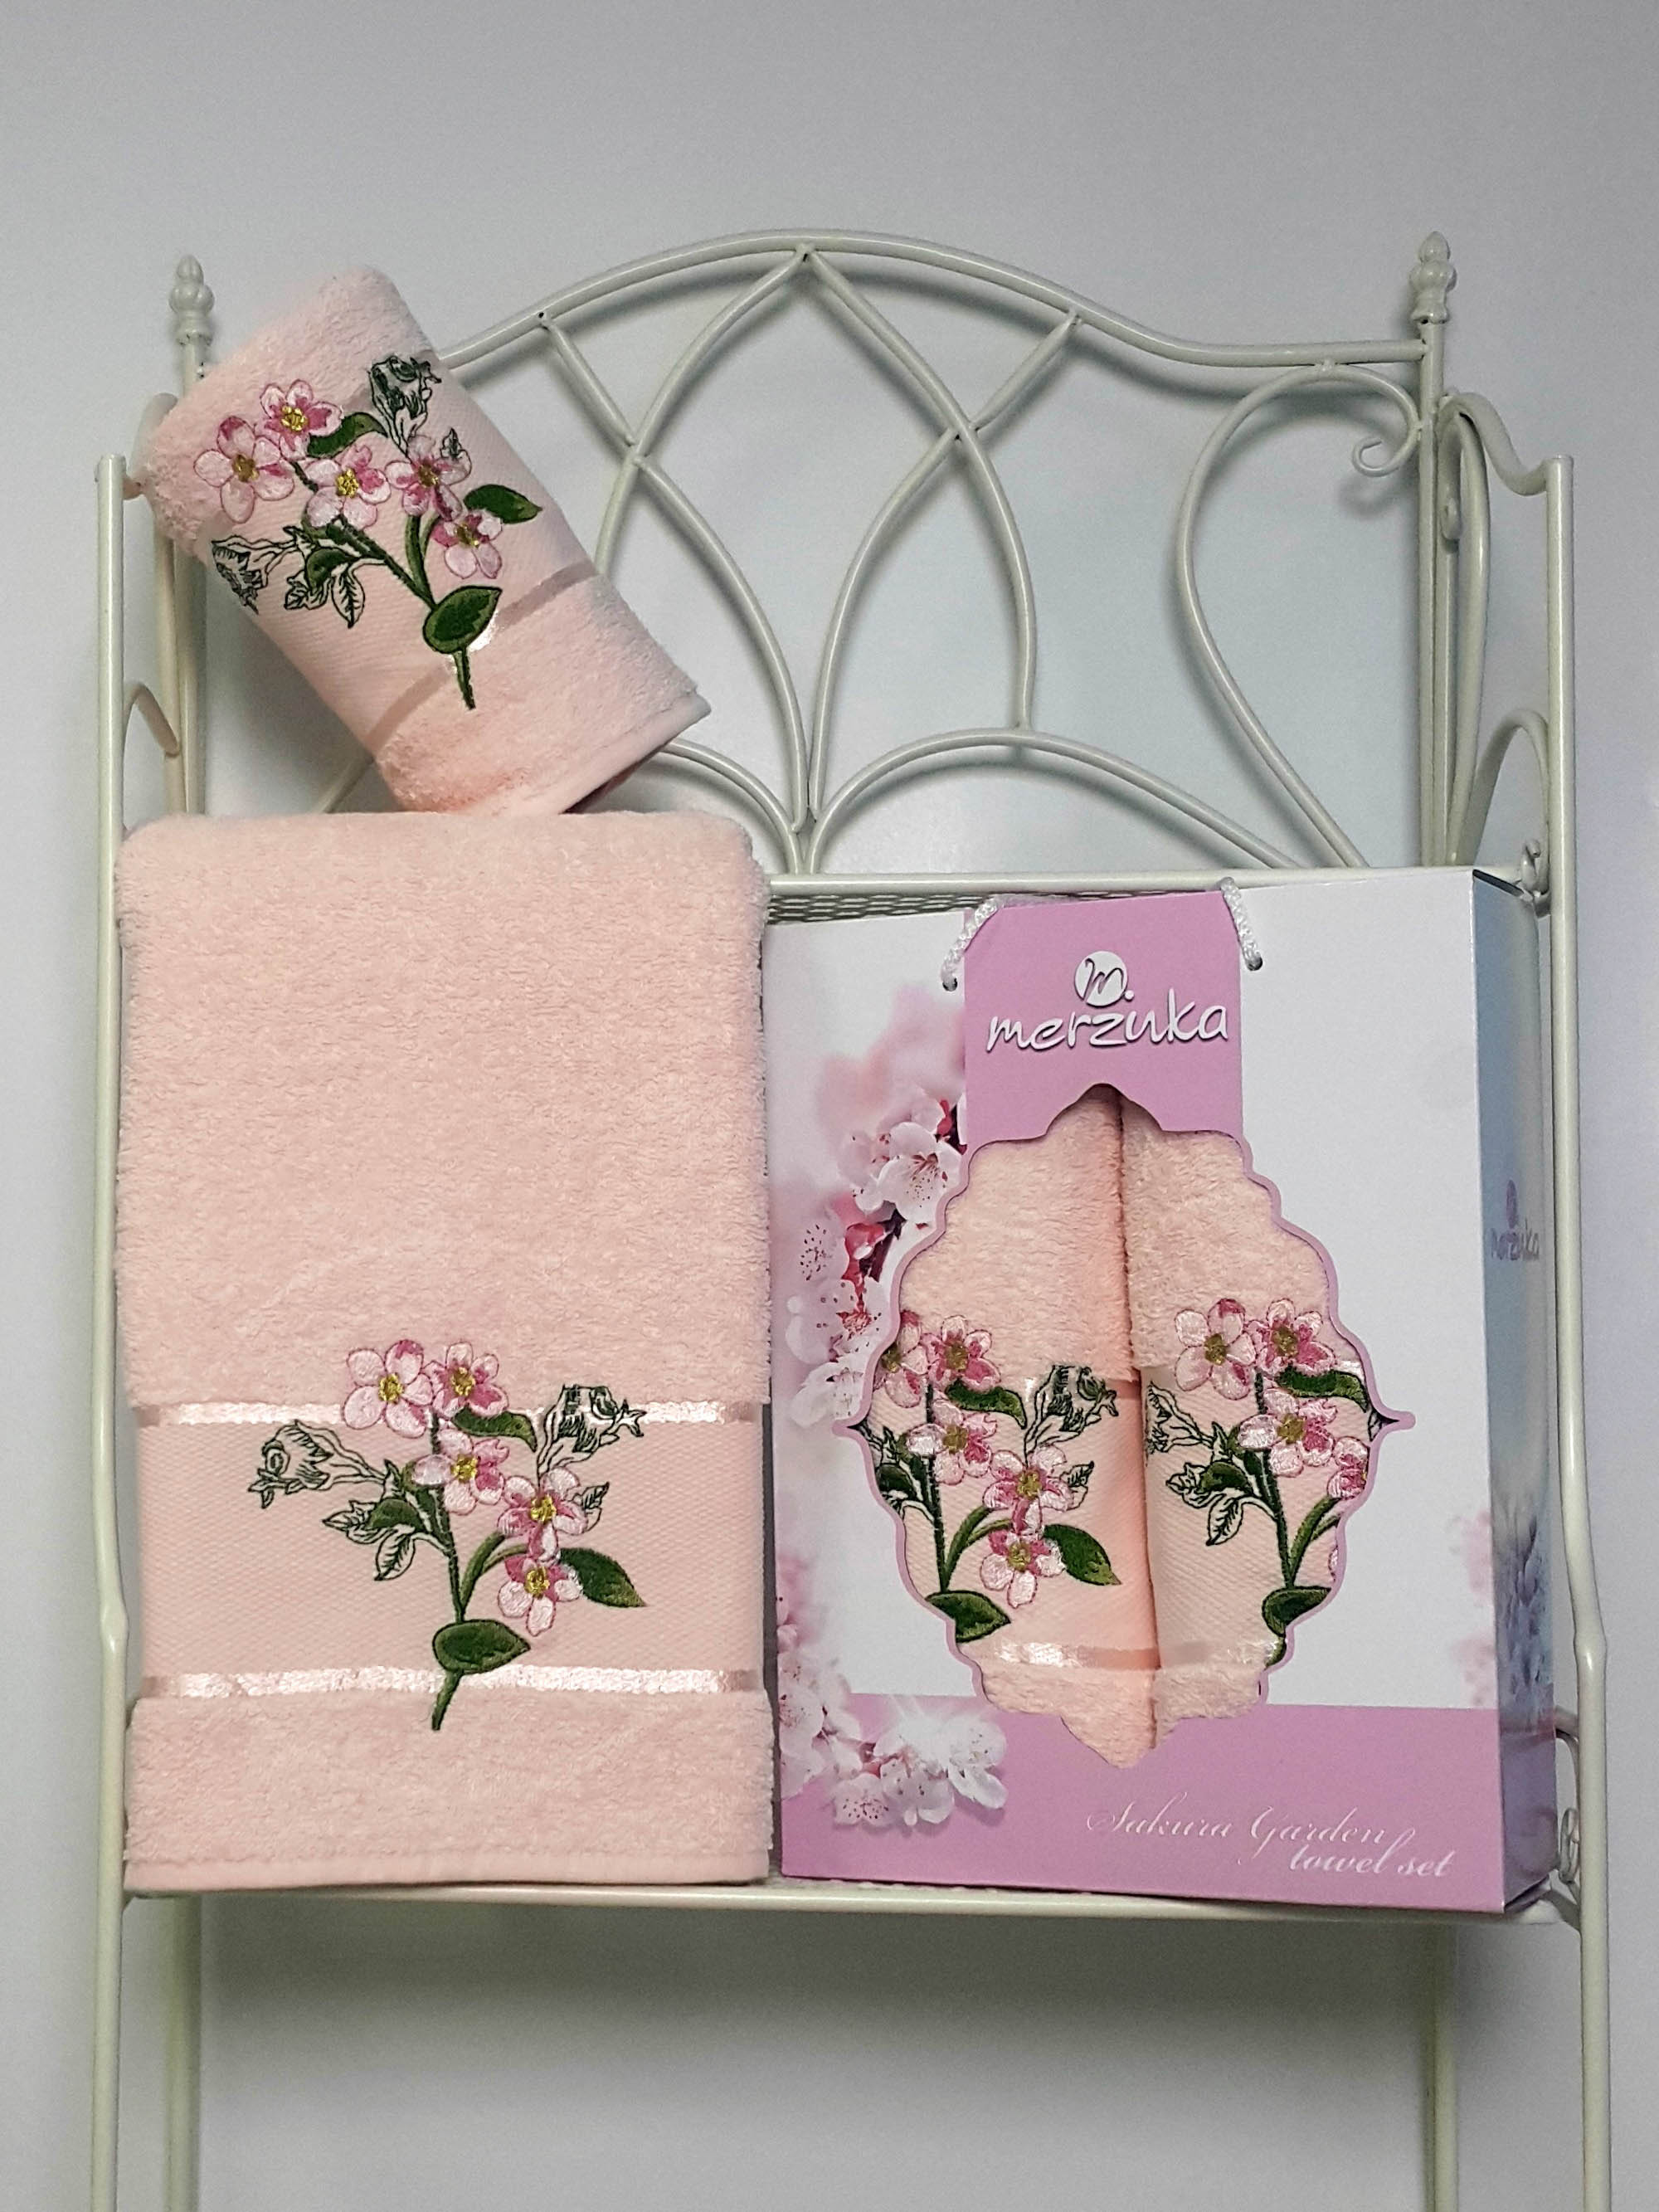 Полотенца Oran Merzuka Набор из 2 полотенец Sakura Garden Цвет: Пудра набор из 2 полотенец merzuka sakura 50х90 70х140 8430 кремовый